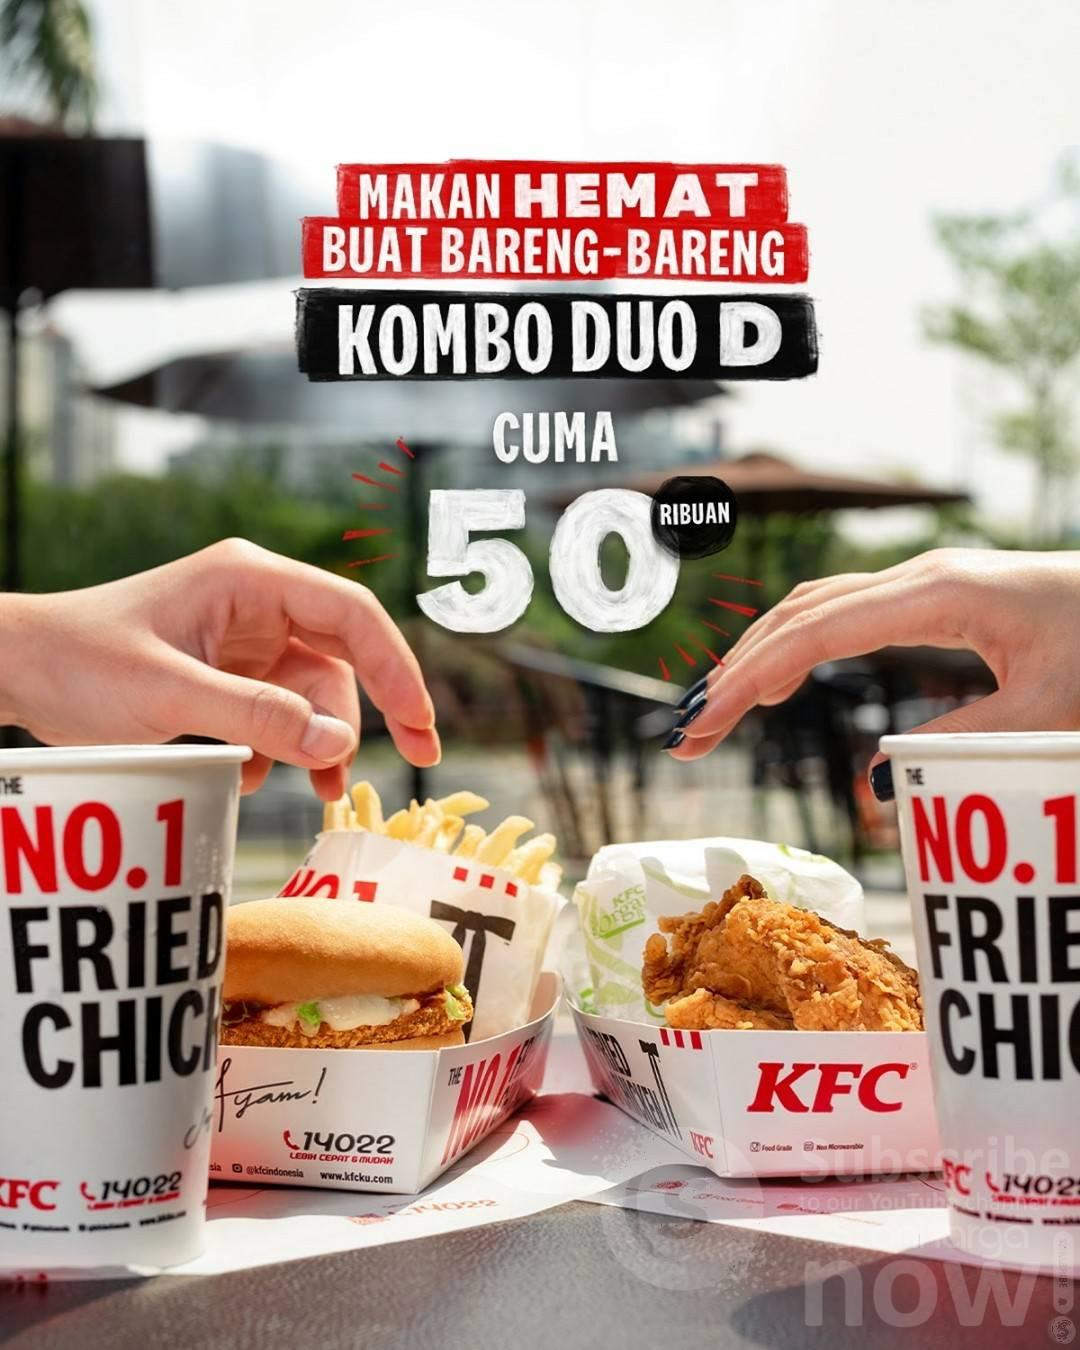 KFC KOMBO DUO D